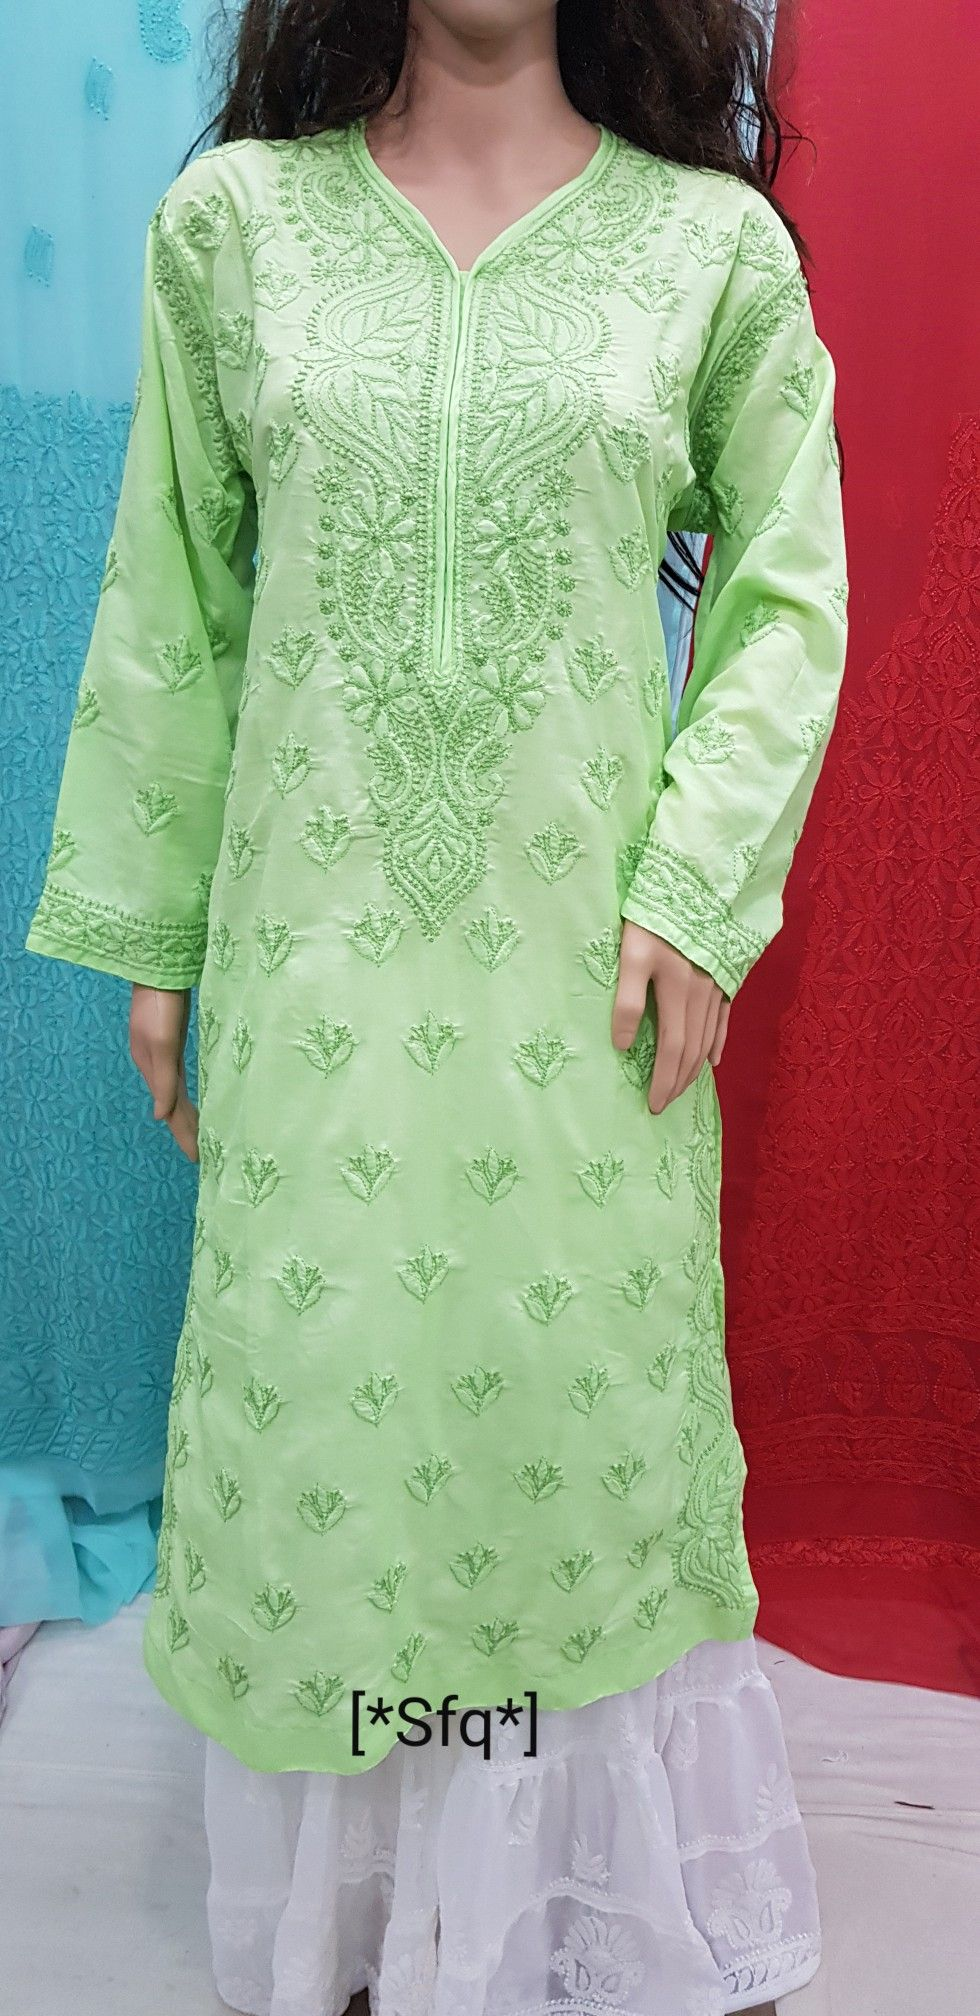 Muslim Fabric Kurtis [*Sfq*]. Chikankari Lucknowi Work #shararadesigns